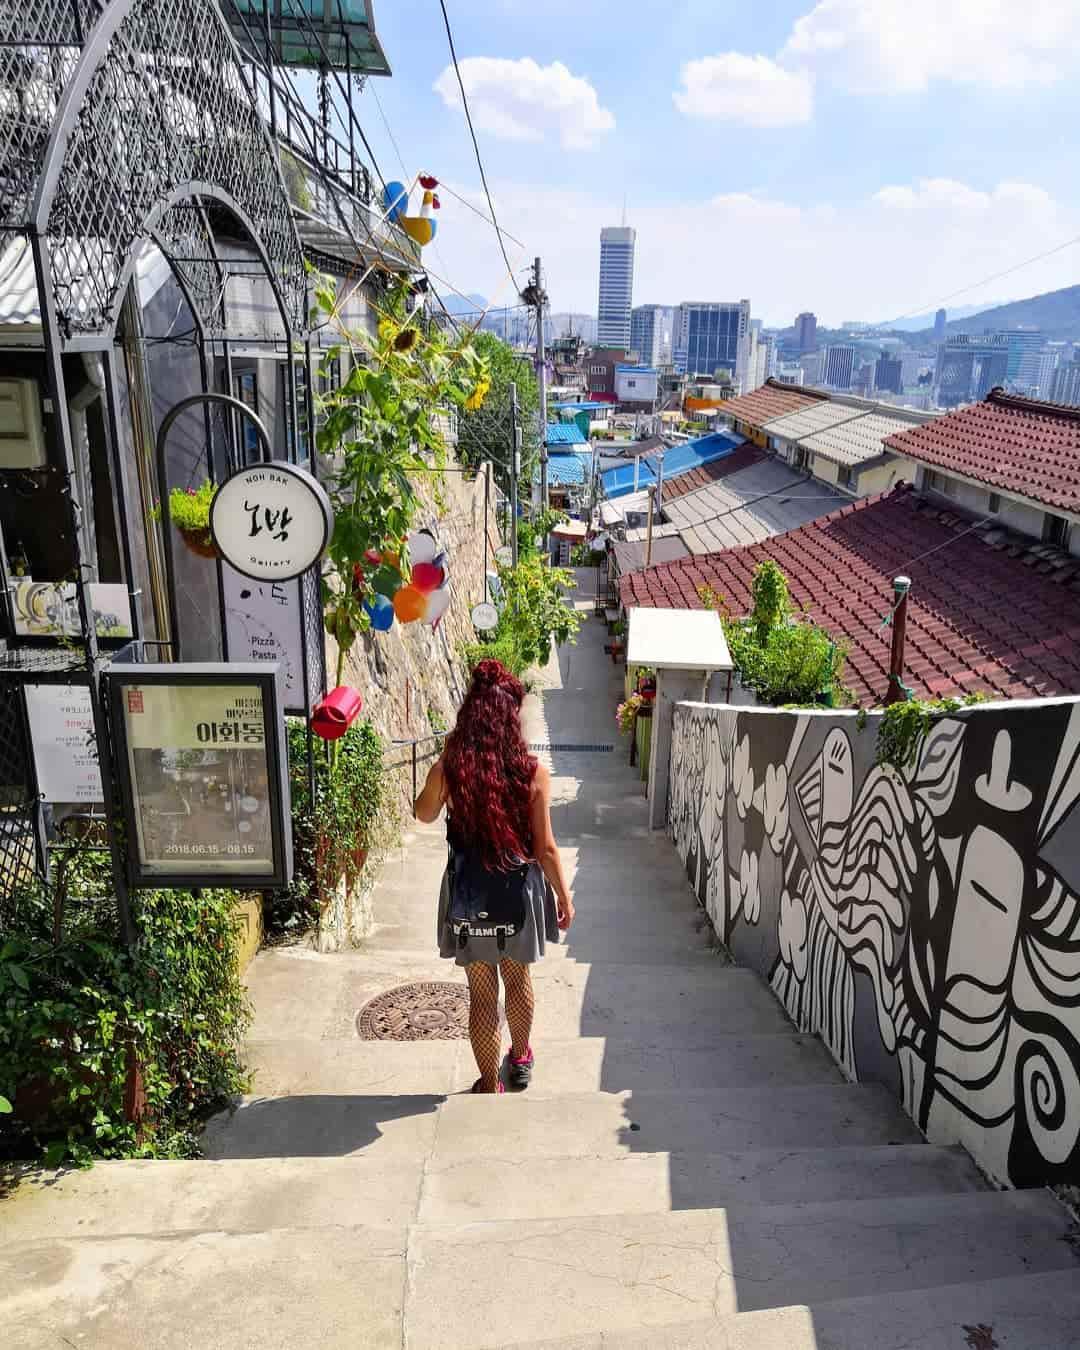 Ihwa Mural Village Sumber Instagram gaeruchan-min